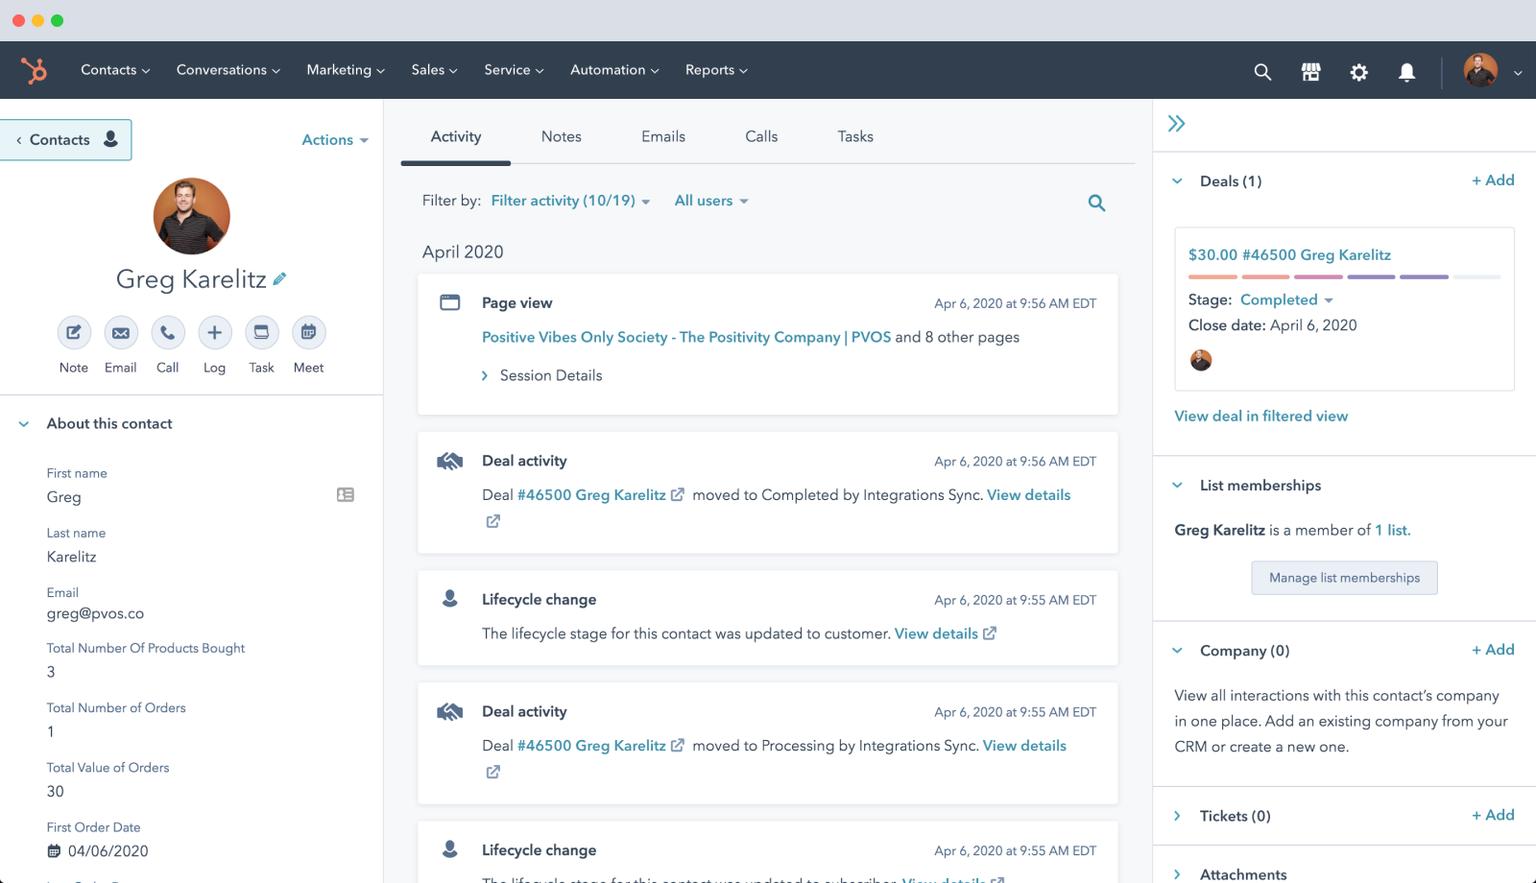 Интерфейс плагина HubSpot для WooCommerce